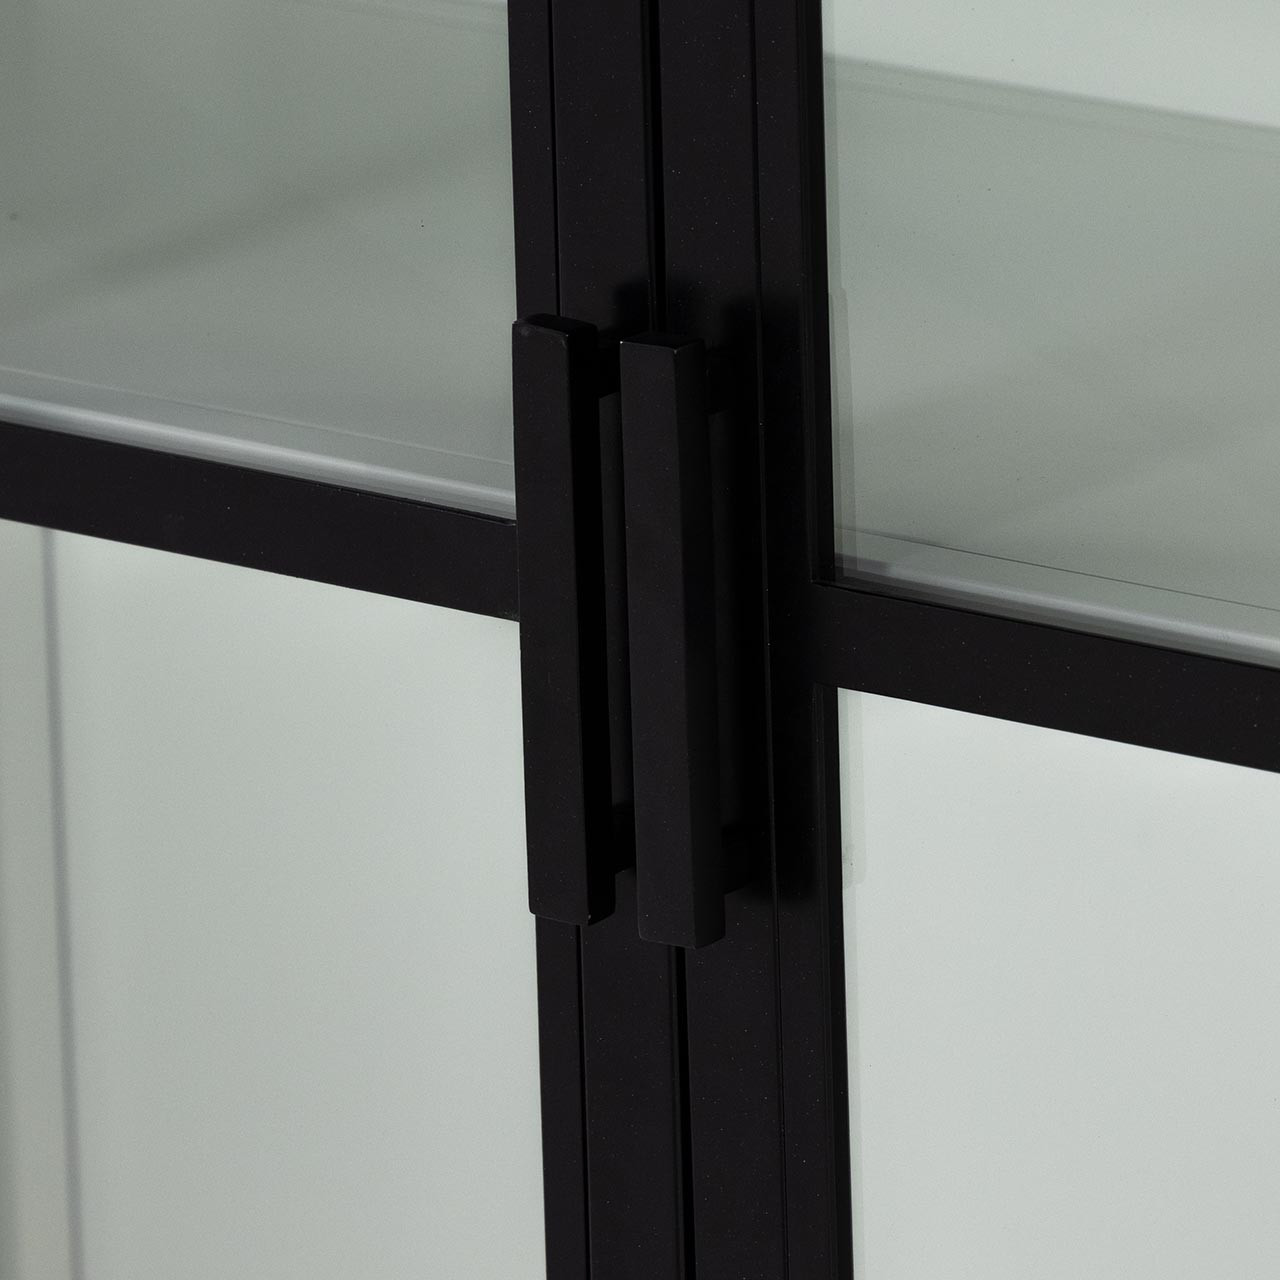 Cindy Glass Cabinet - Black